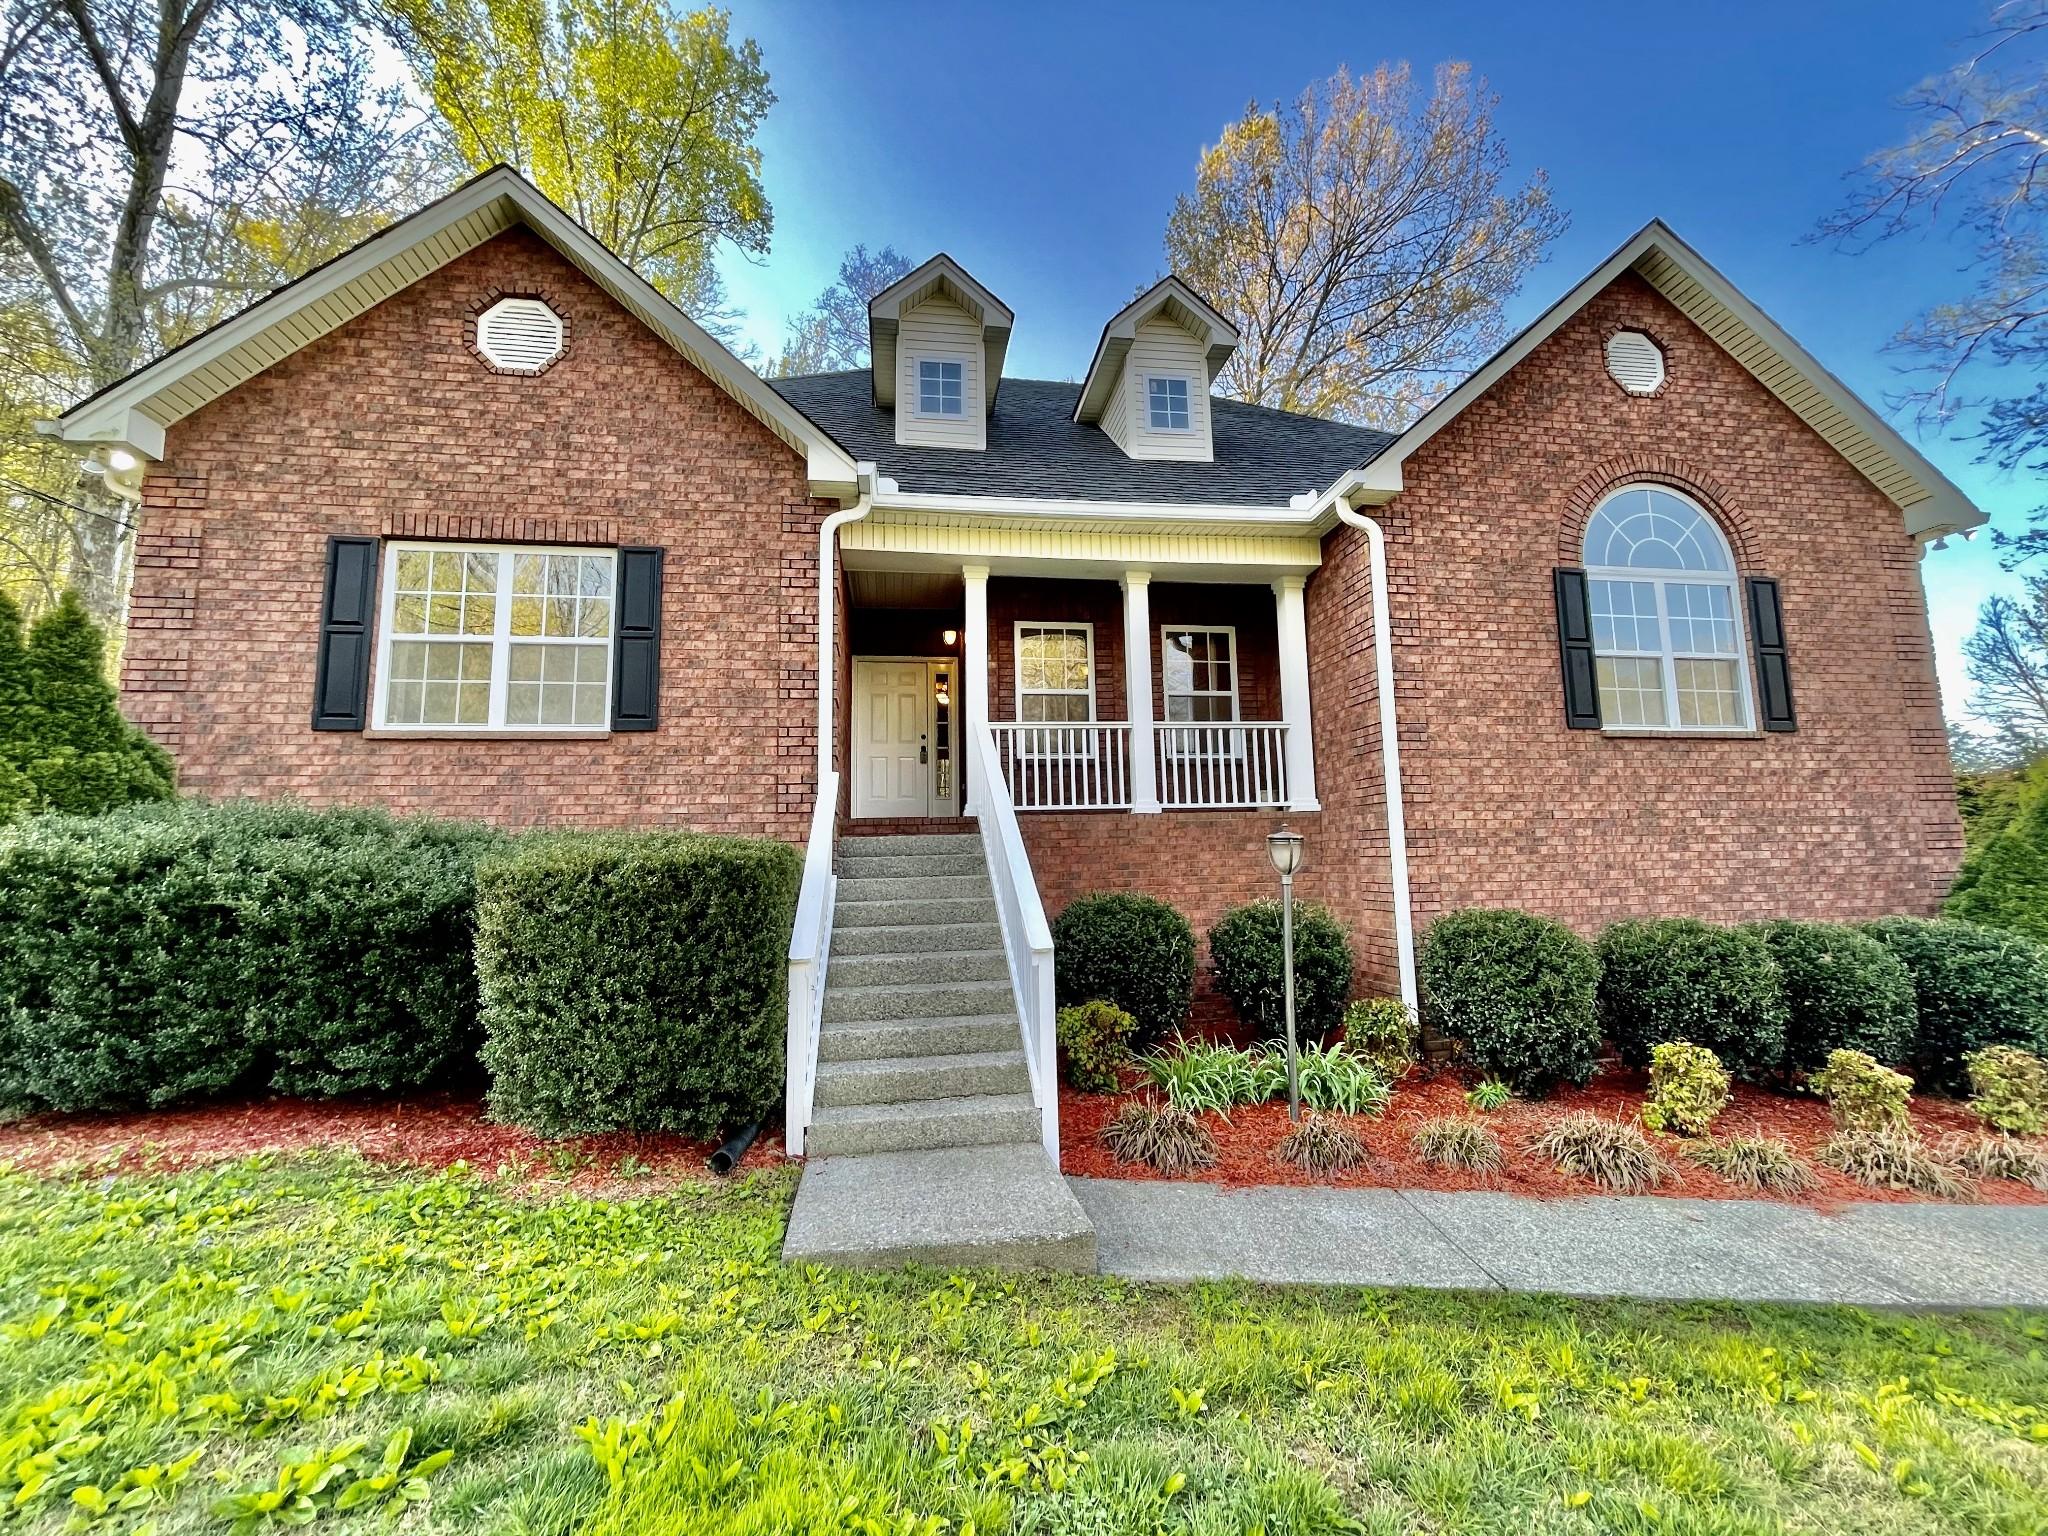 102 High Ridge Trl Property Photo - Goodlettsville, TN real estate listing